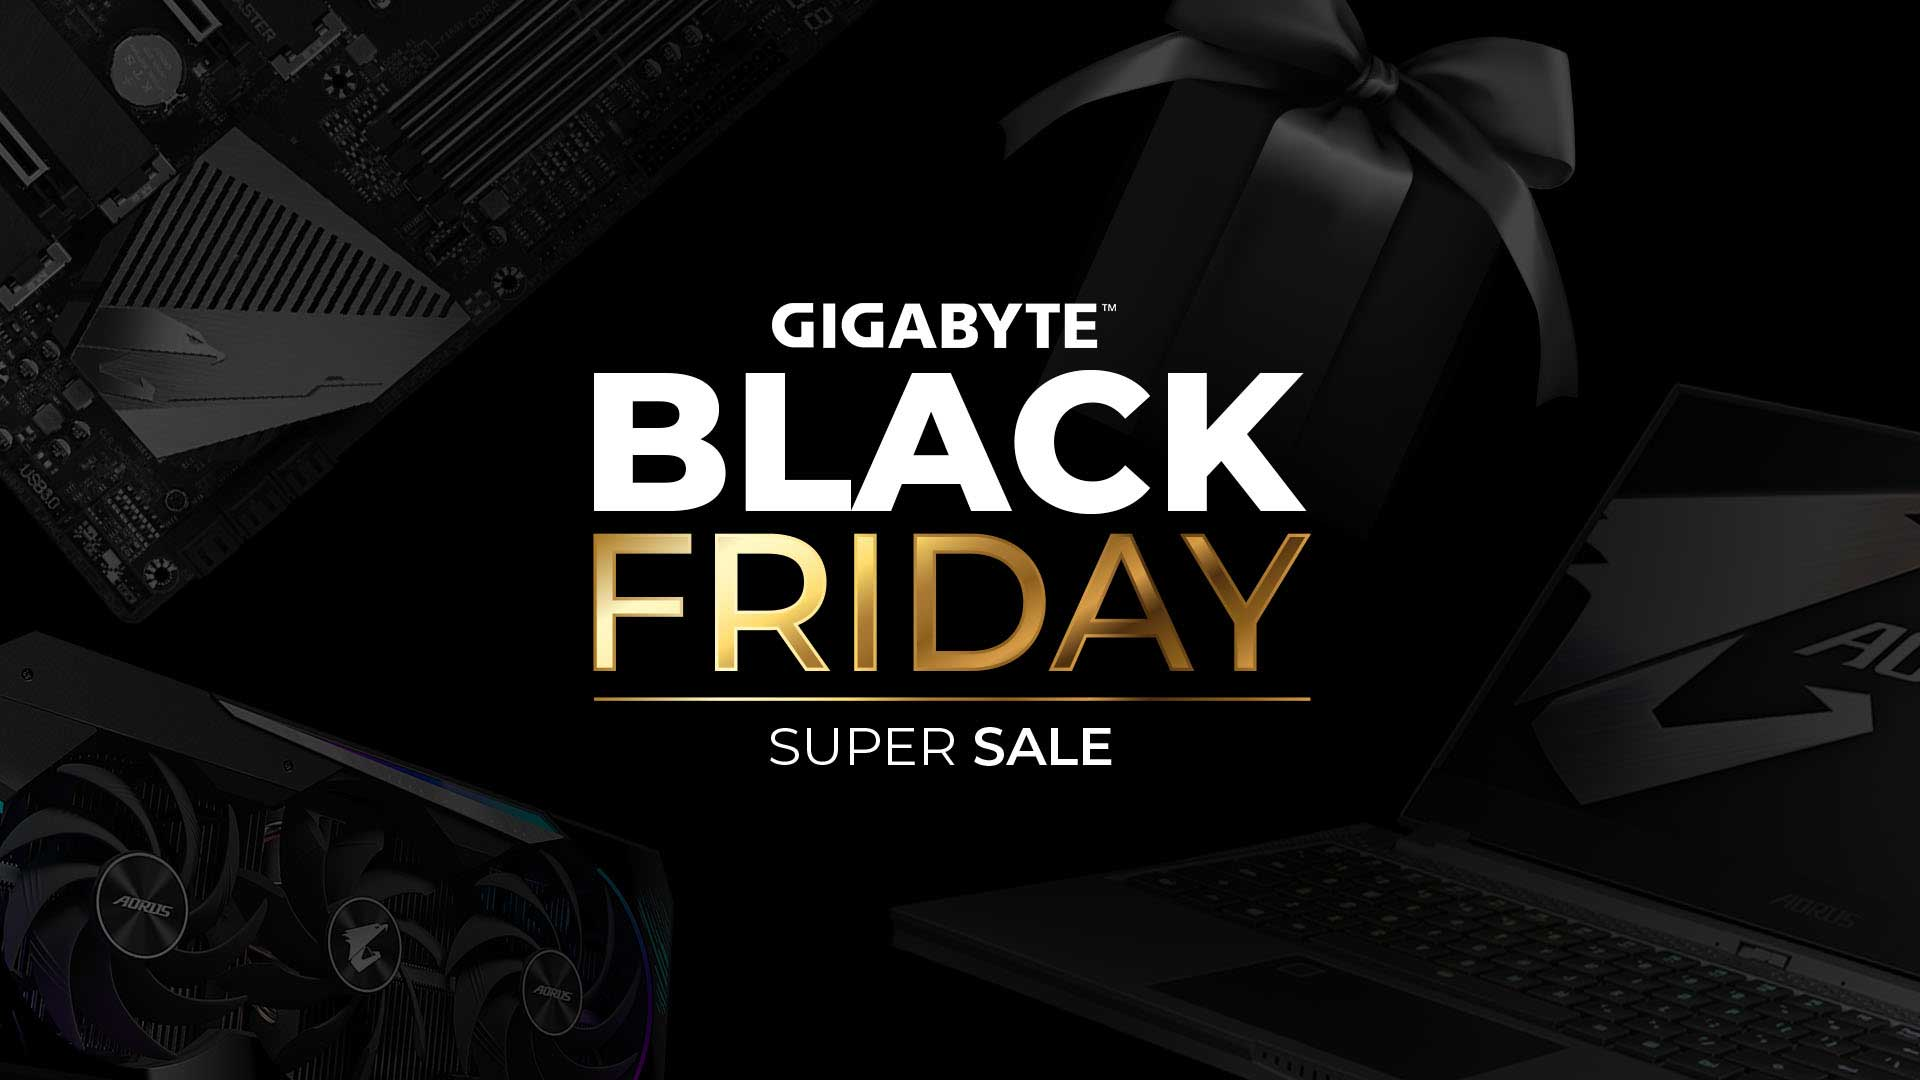 Gigabyte South African Black Friday Deals